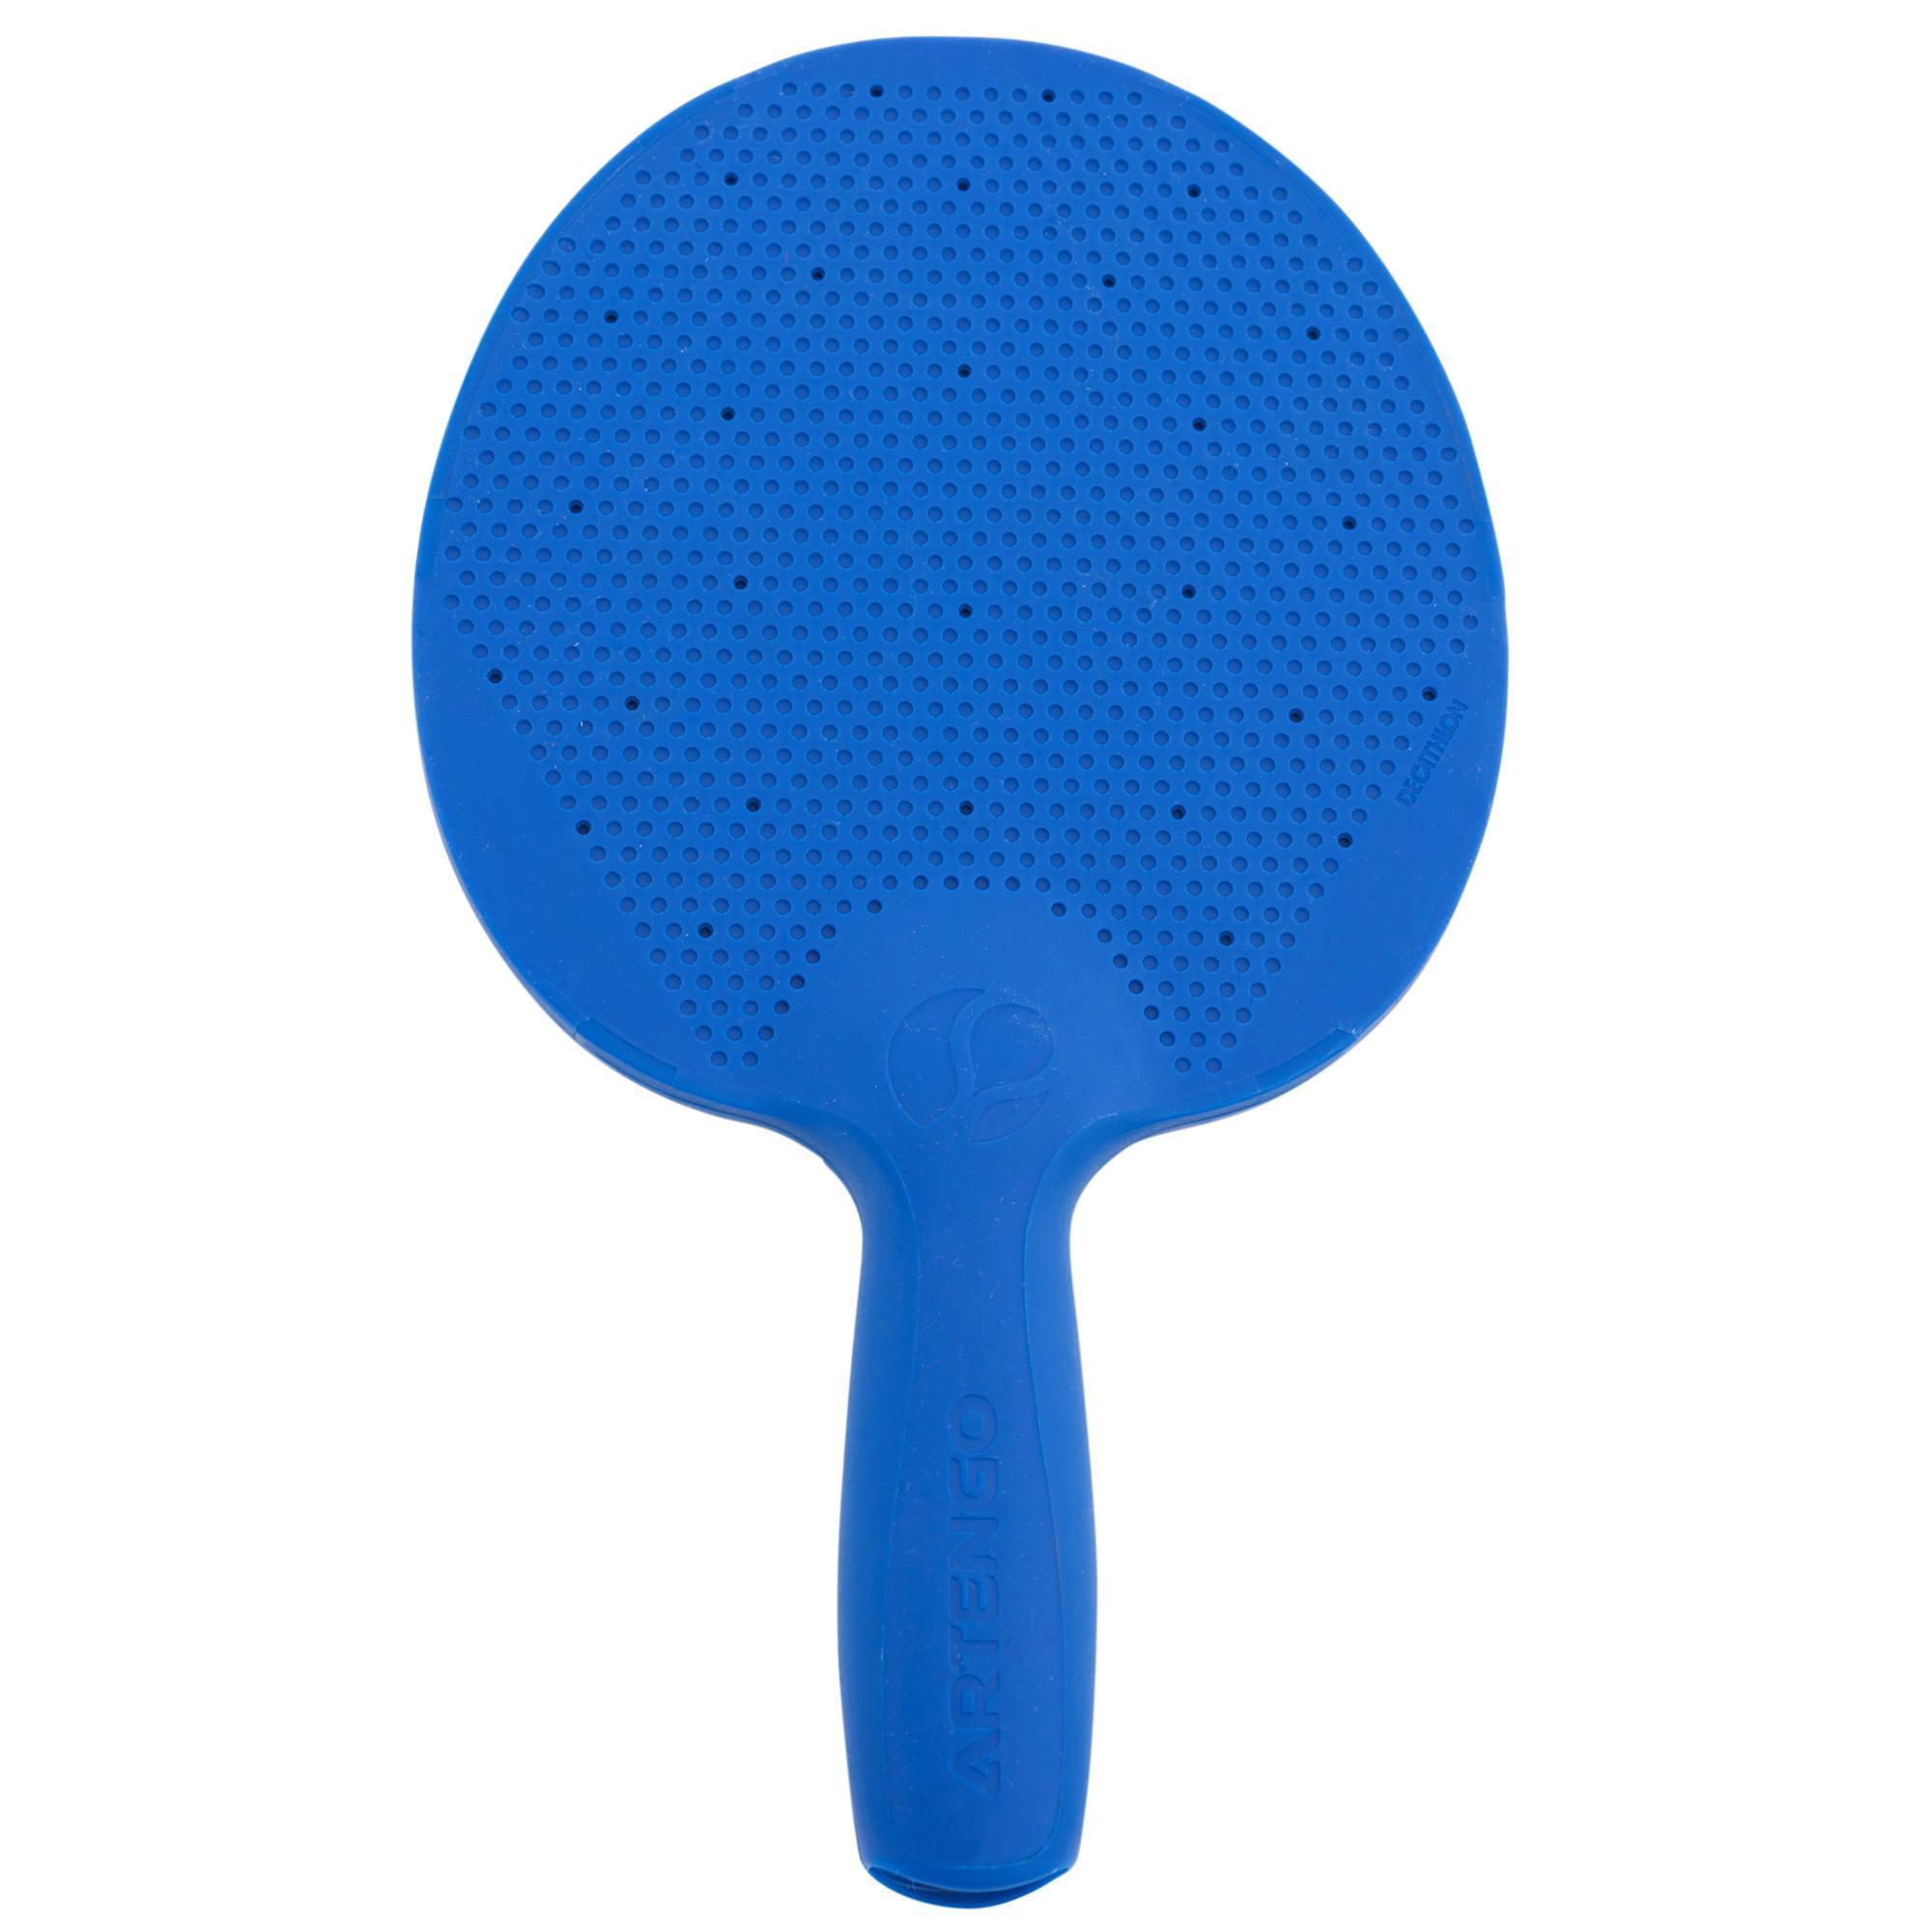 Raquette OUTDOOR ARTENGO FR 100 O Bleu